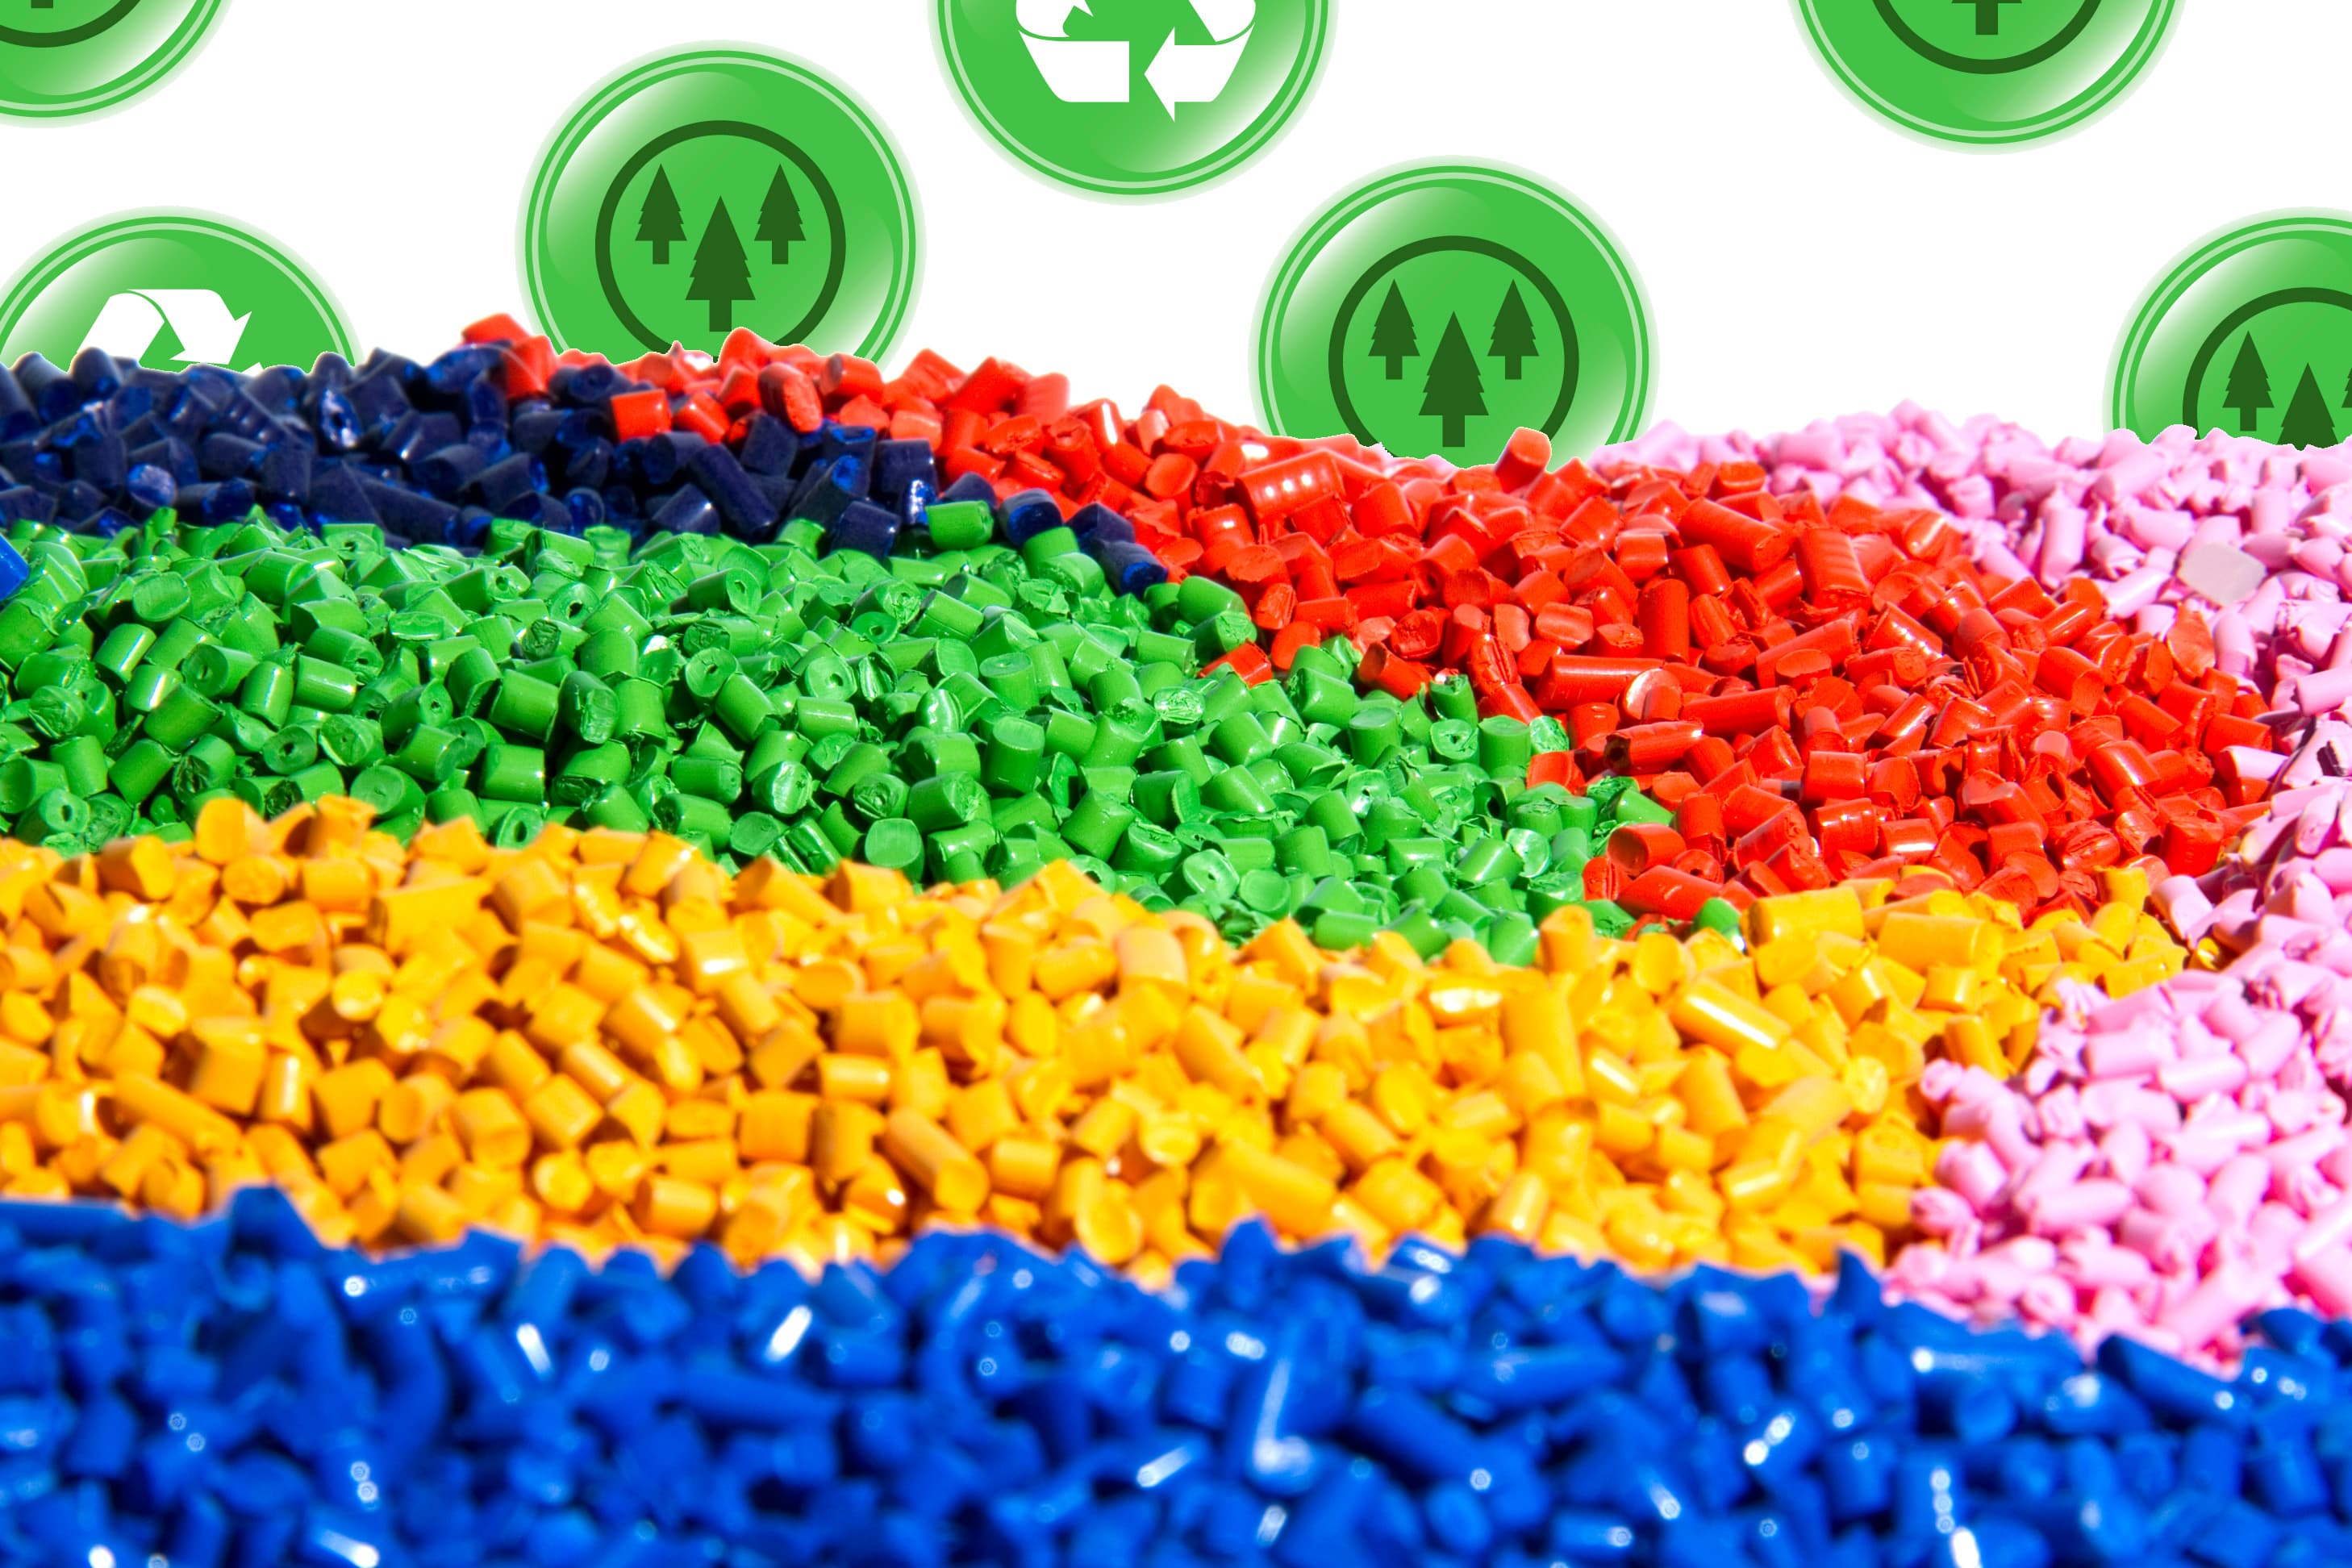 MIT-Biodegradable-Plastic-01